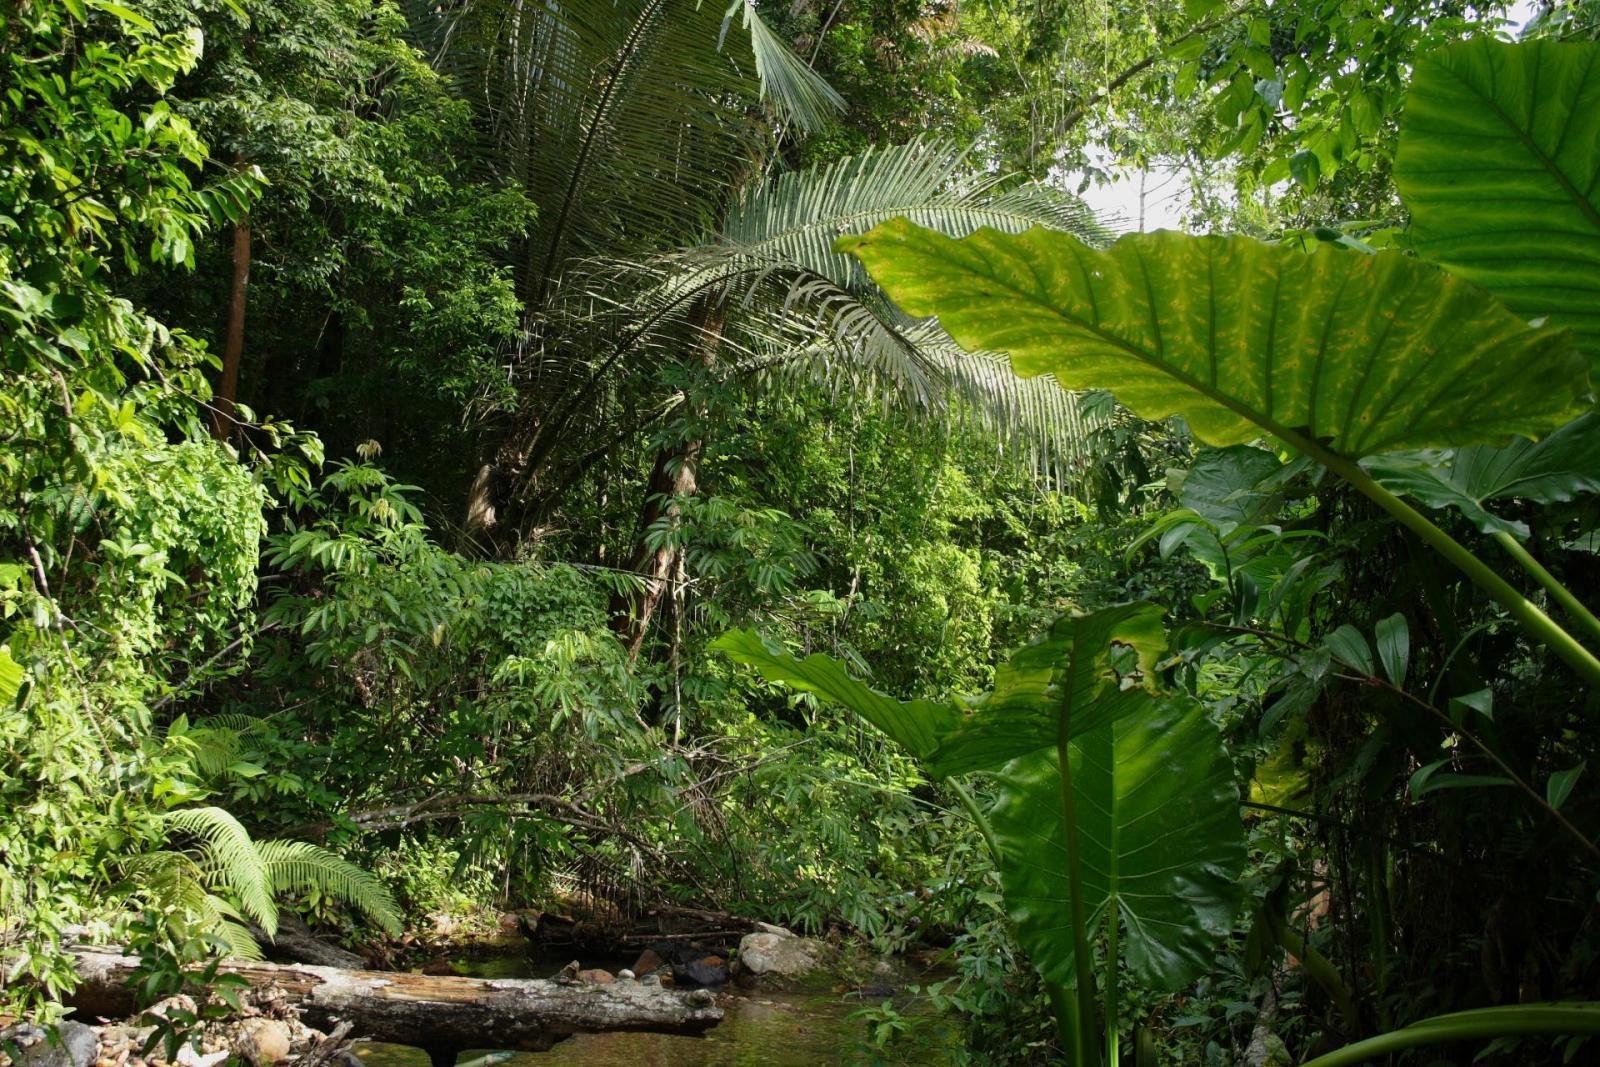 Regenwald meets Great Barrier Reef Australien